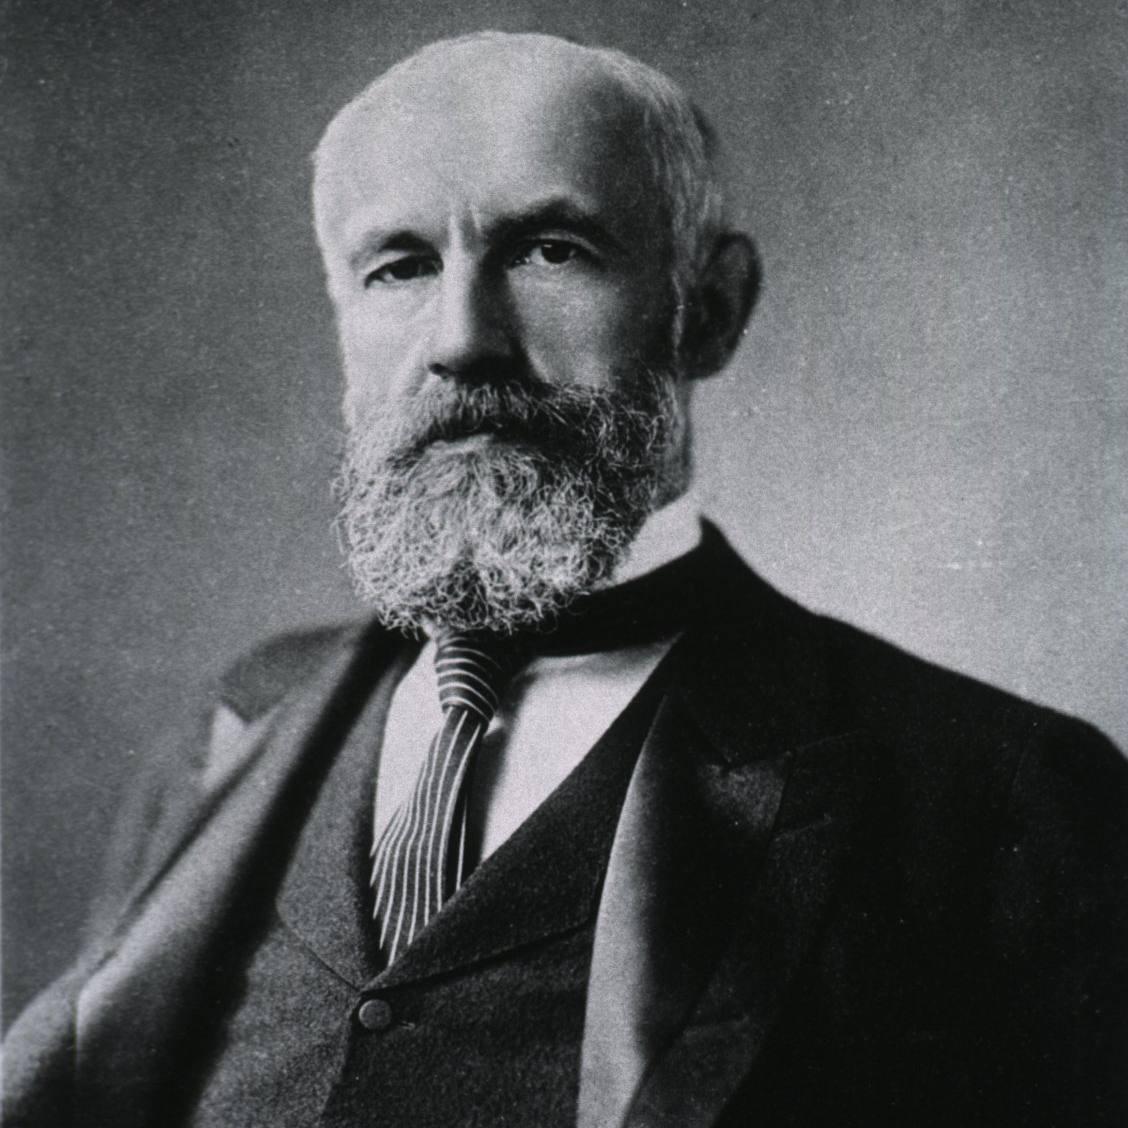 G Stanley Hall